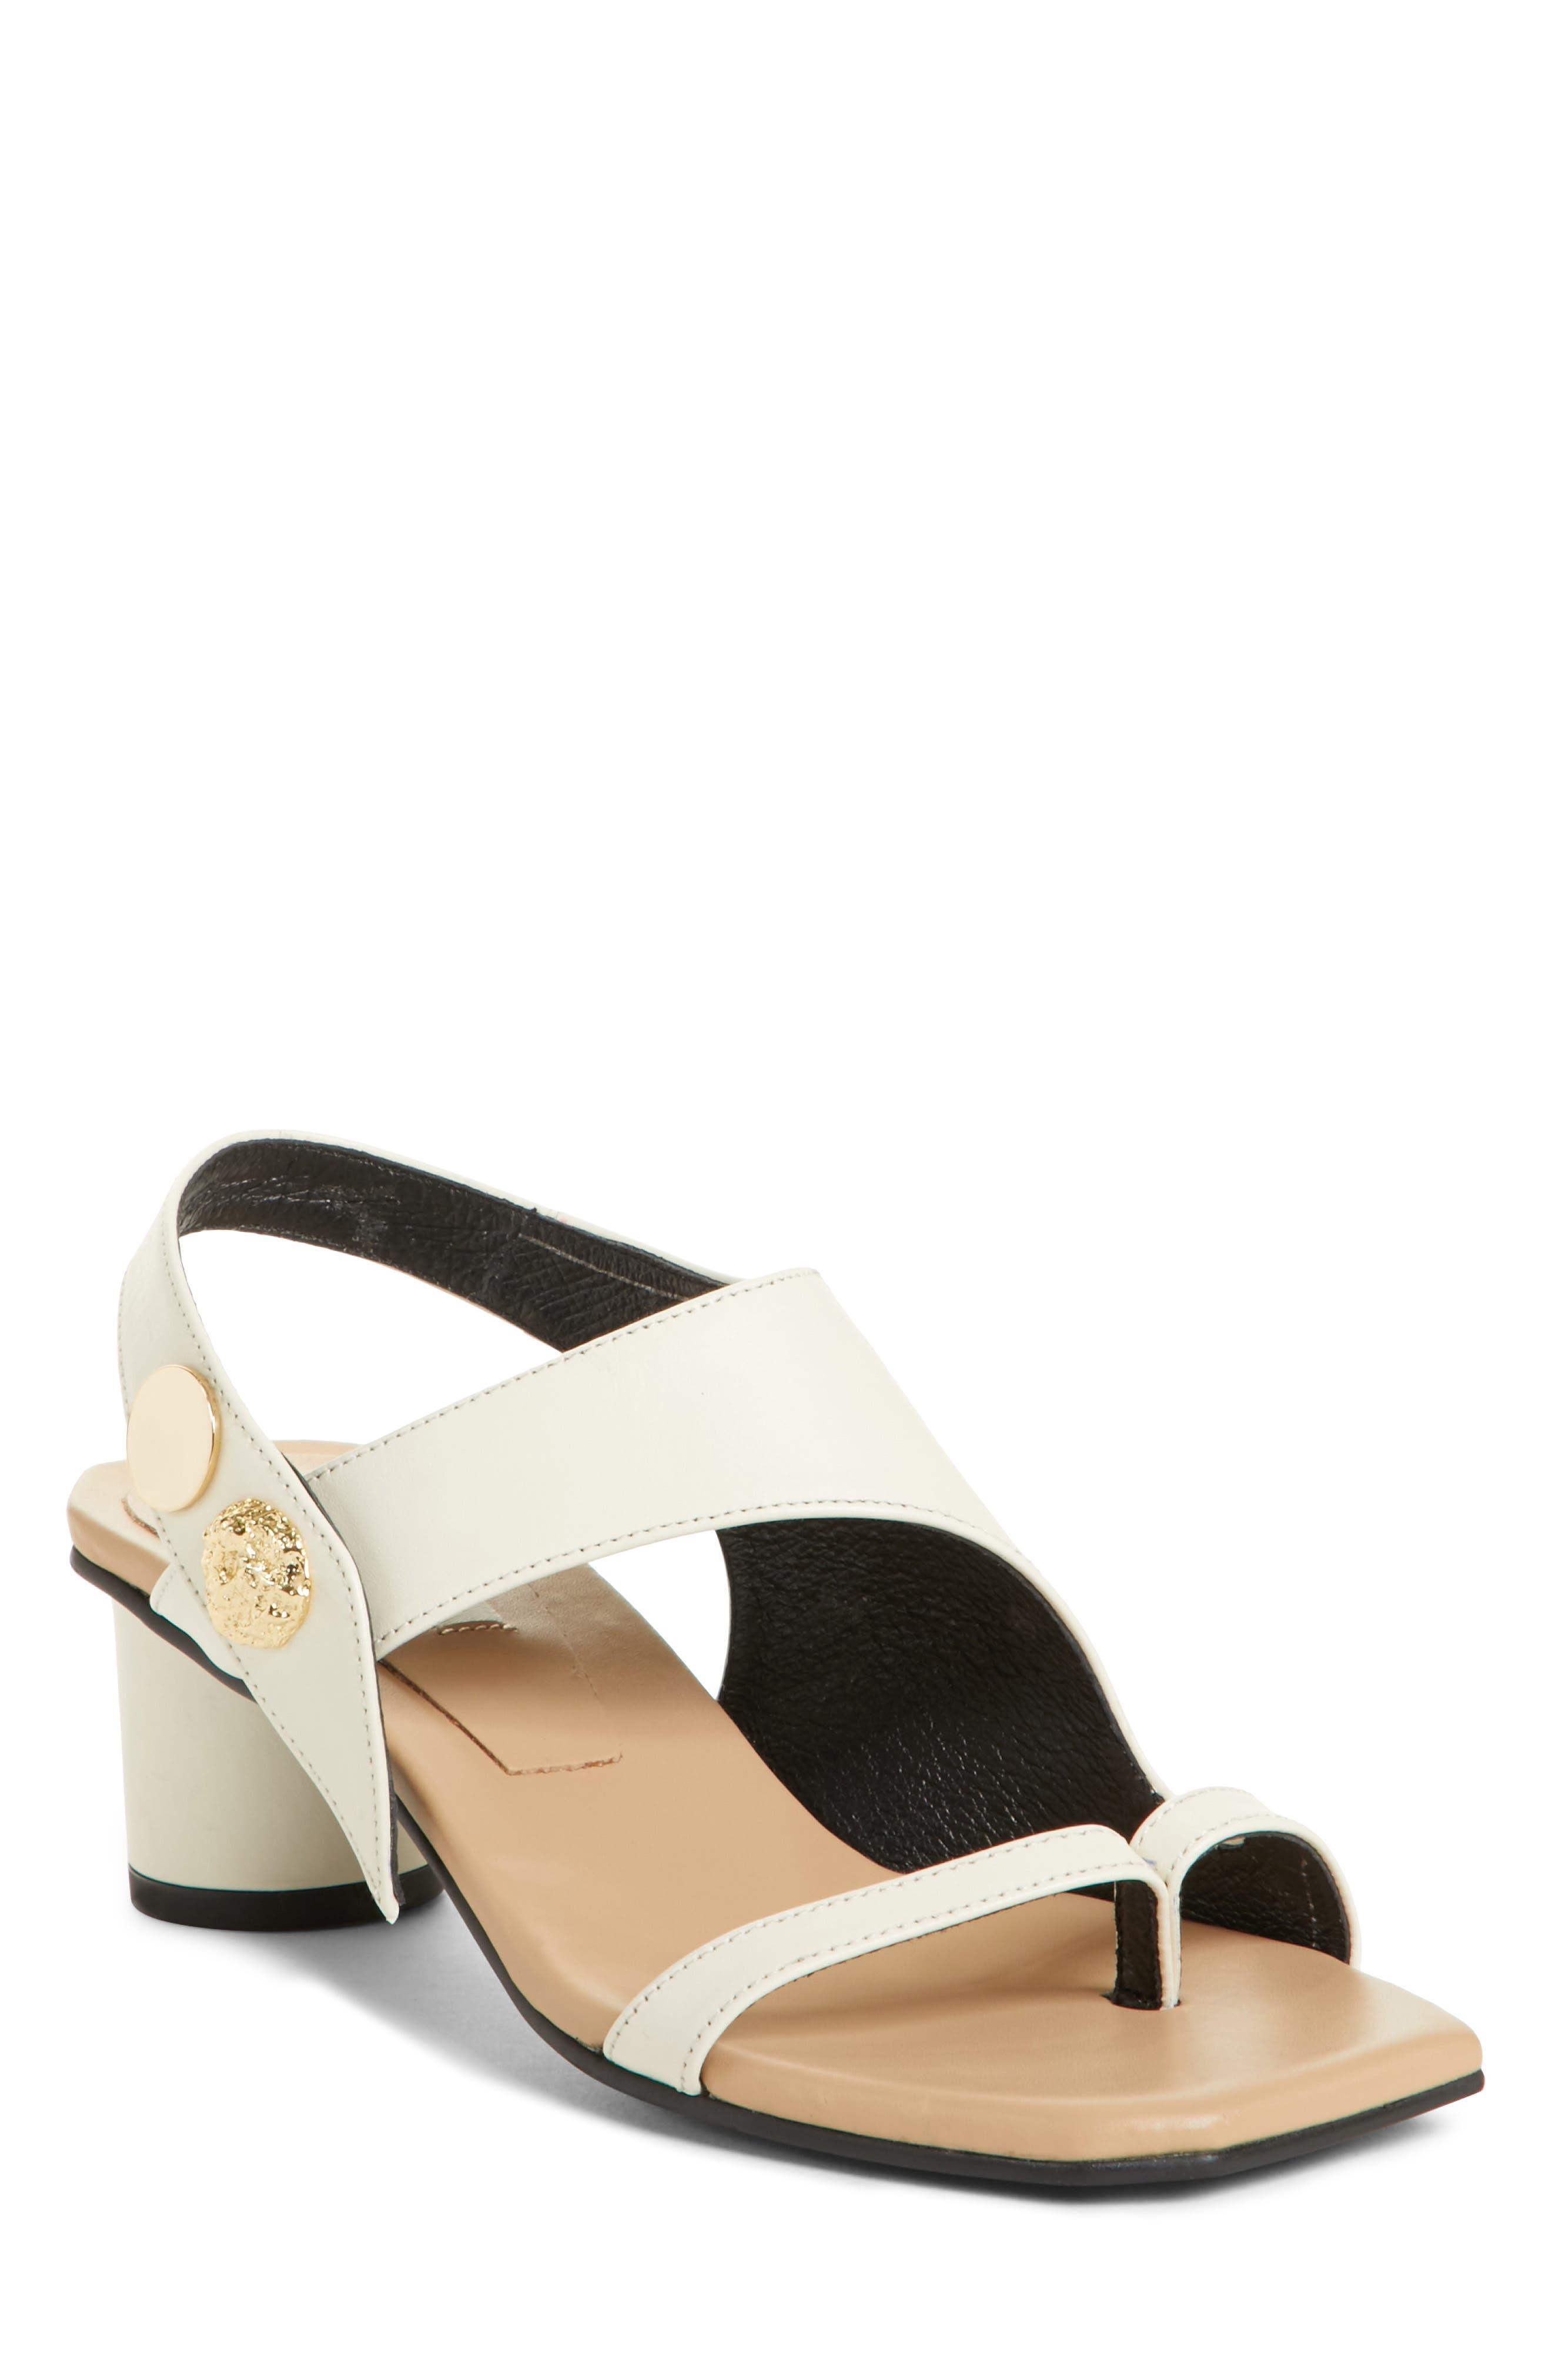 Embellished Leather Sandal,                             Main thumbnail 1, color,                             Beige Cream